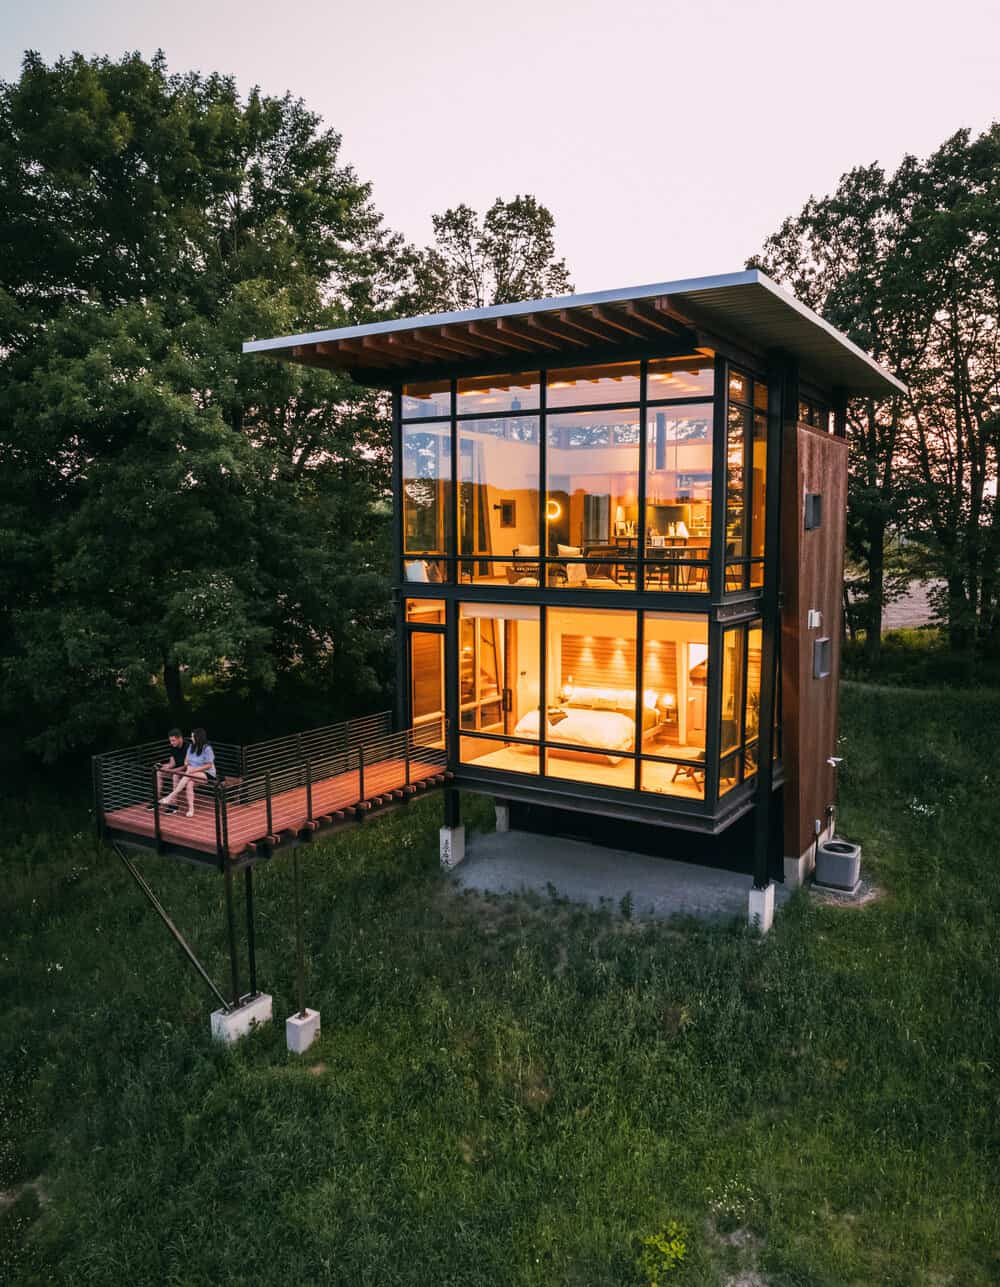 small-metal-cabin-exterior-dusk